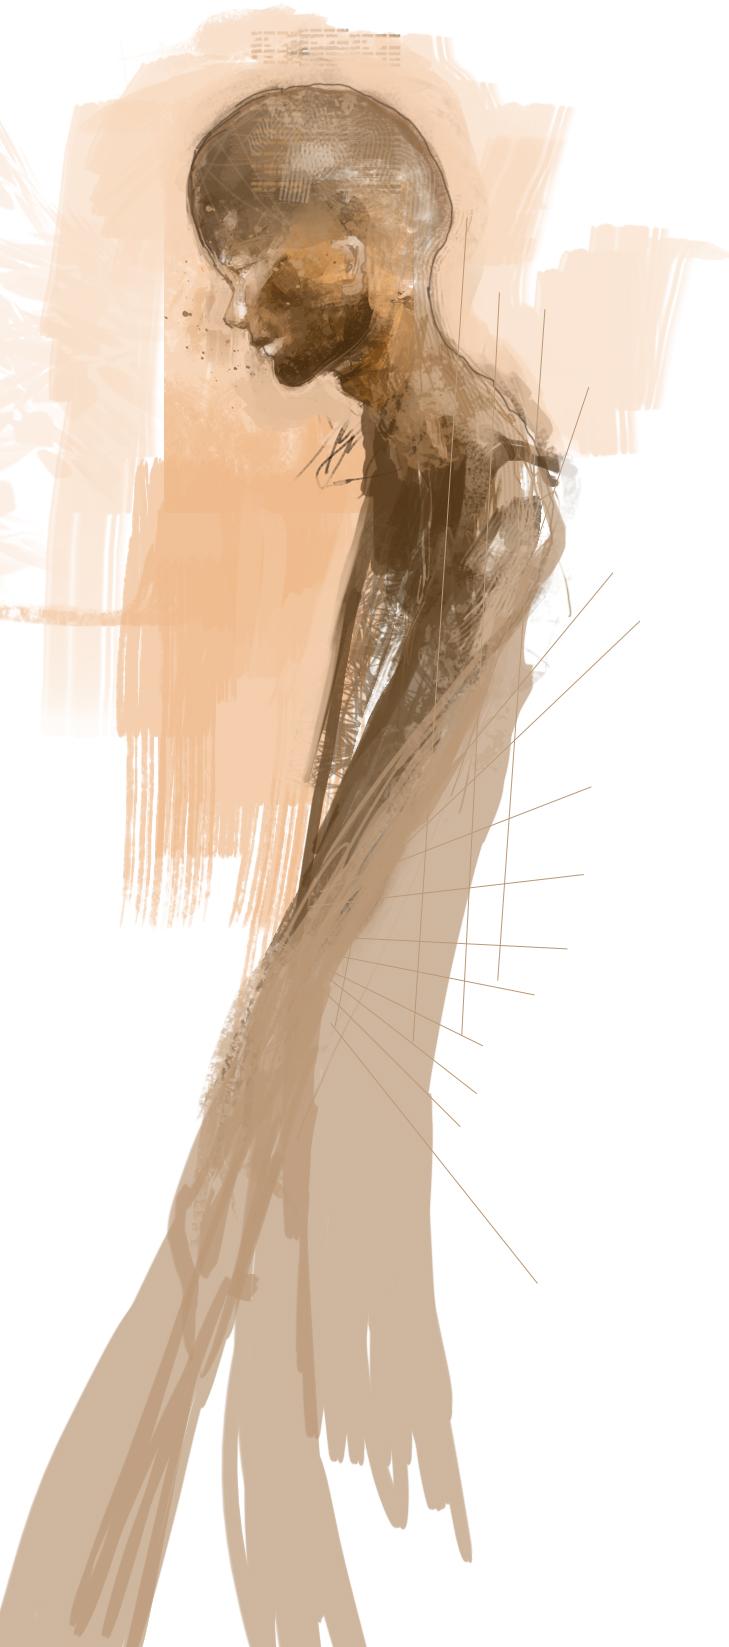 Sketch mcbook (update: 4 august 2013